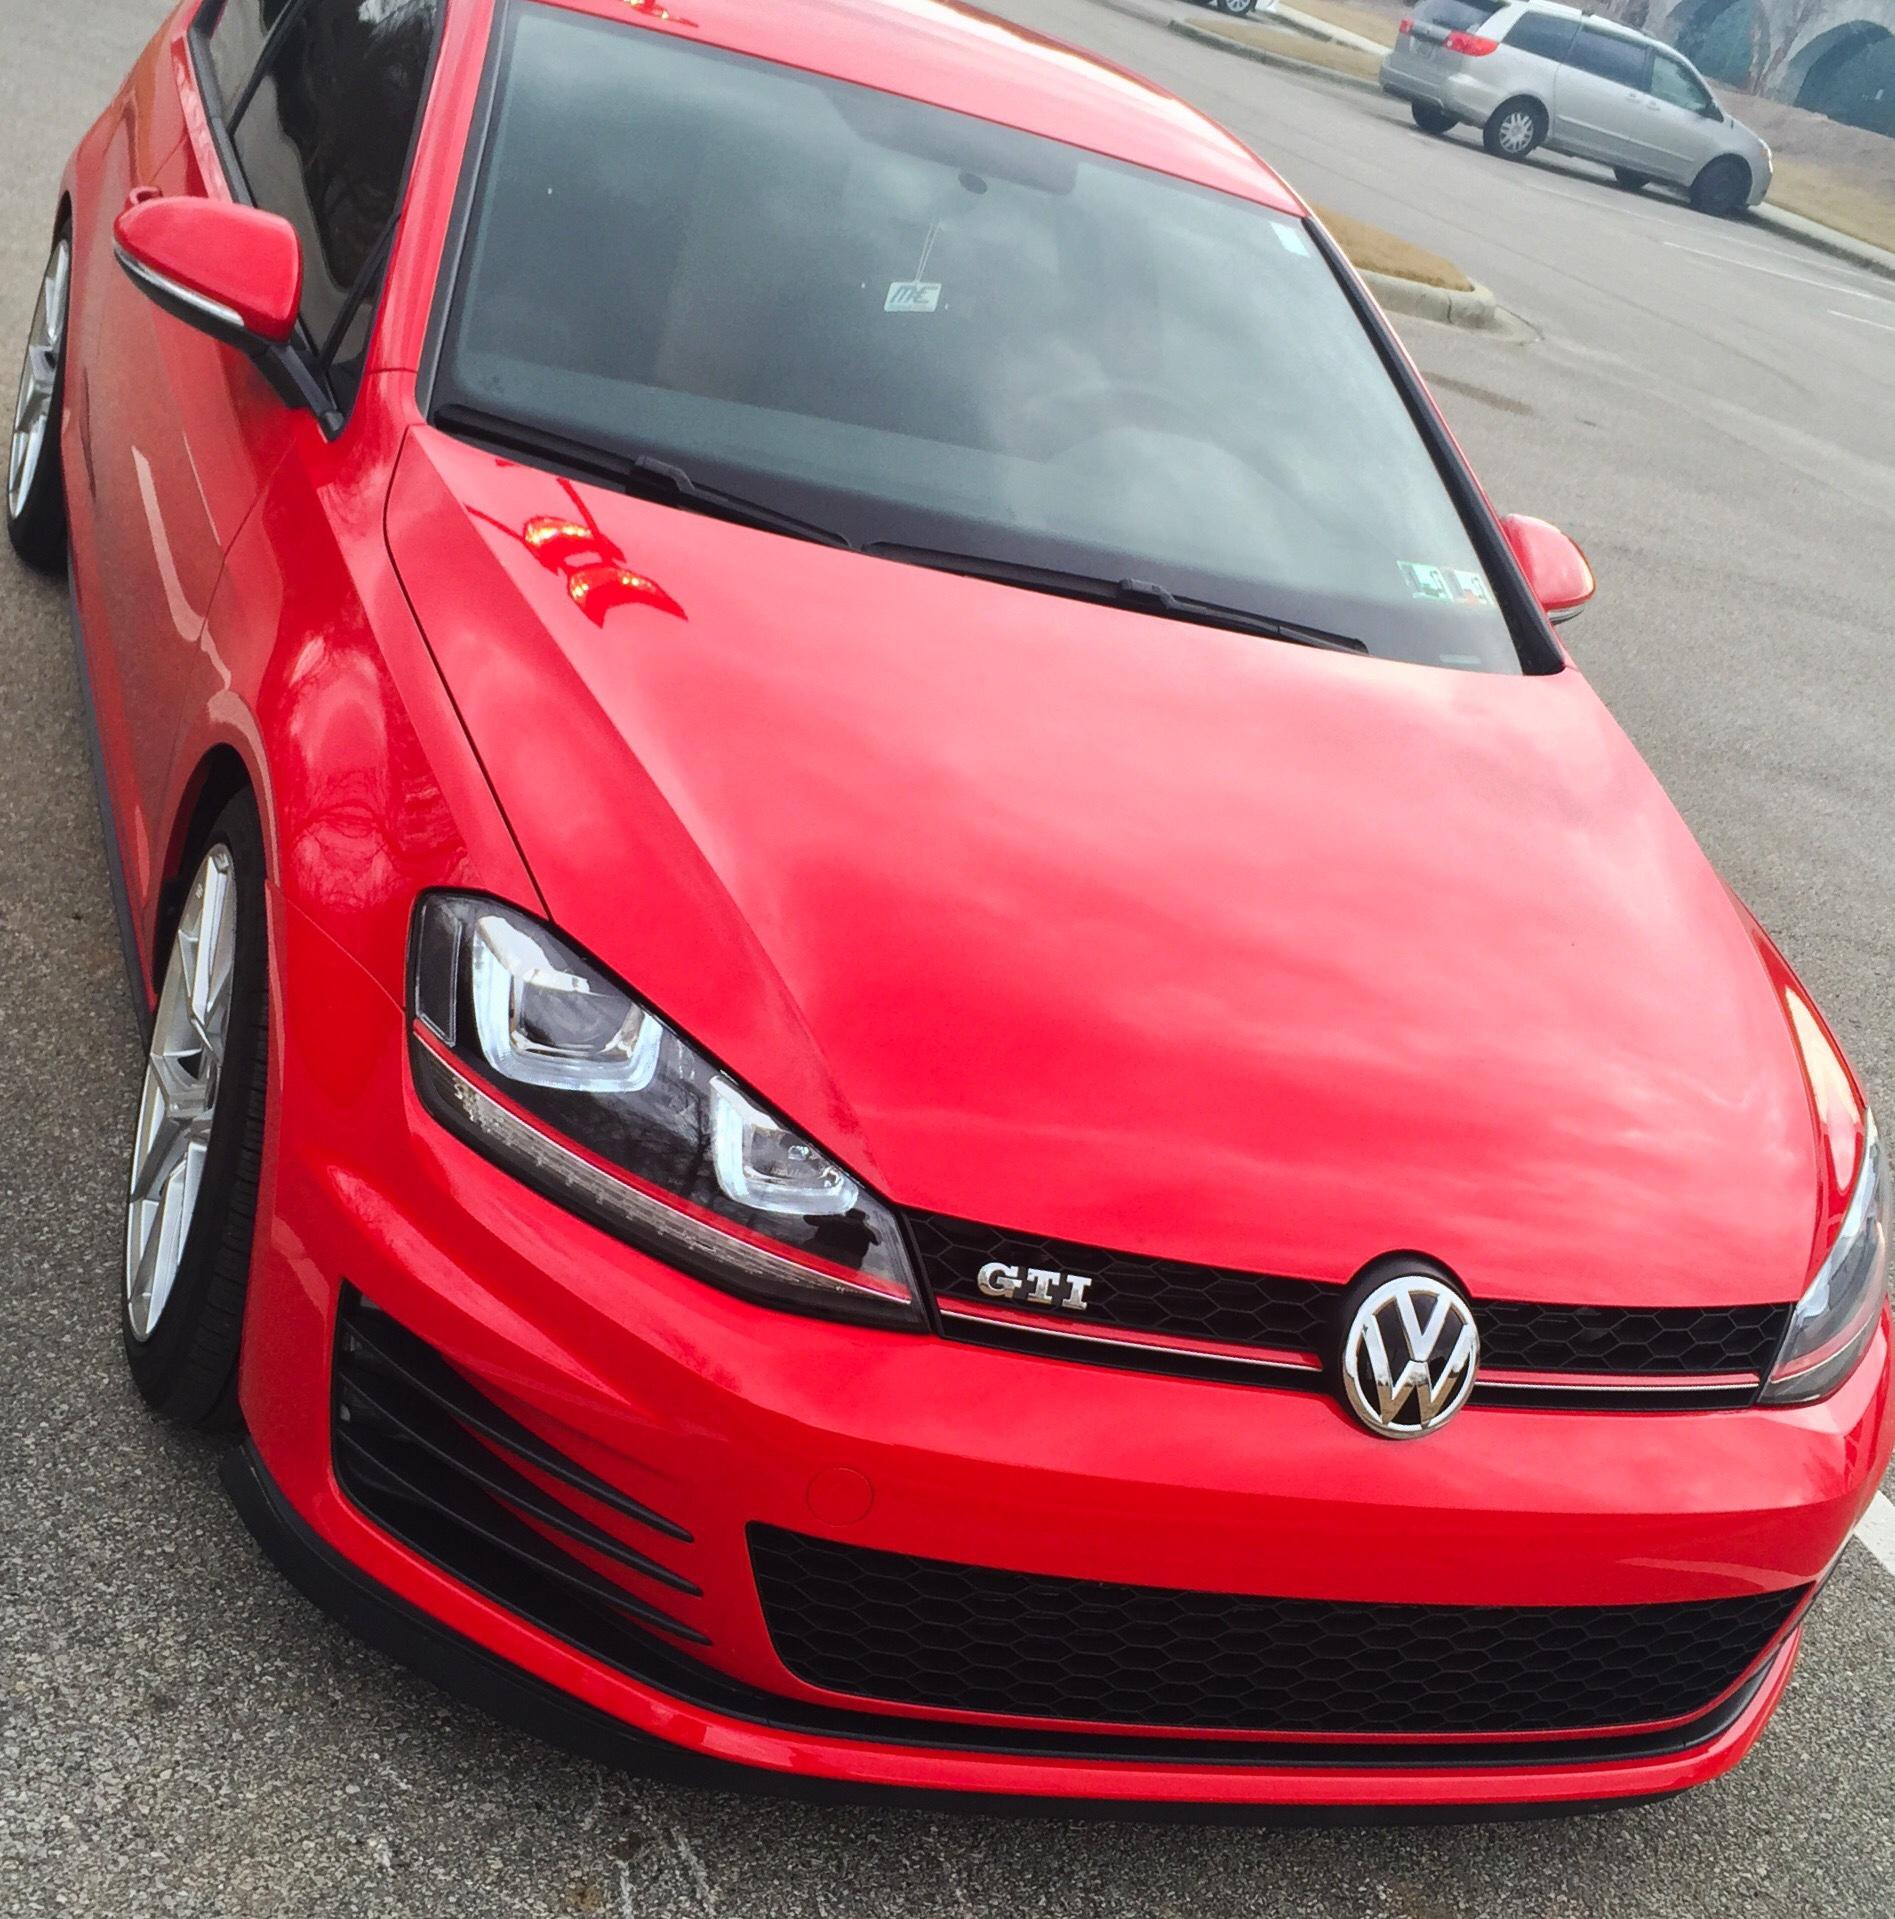 Volkswagen Dealers In Maine: Official Tornado Red GTI / Golf Thread